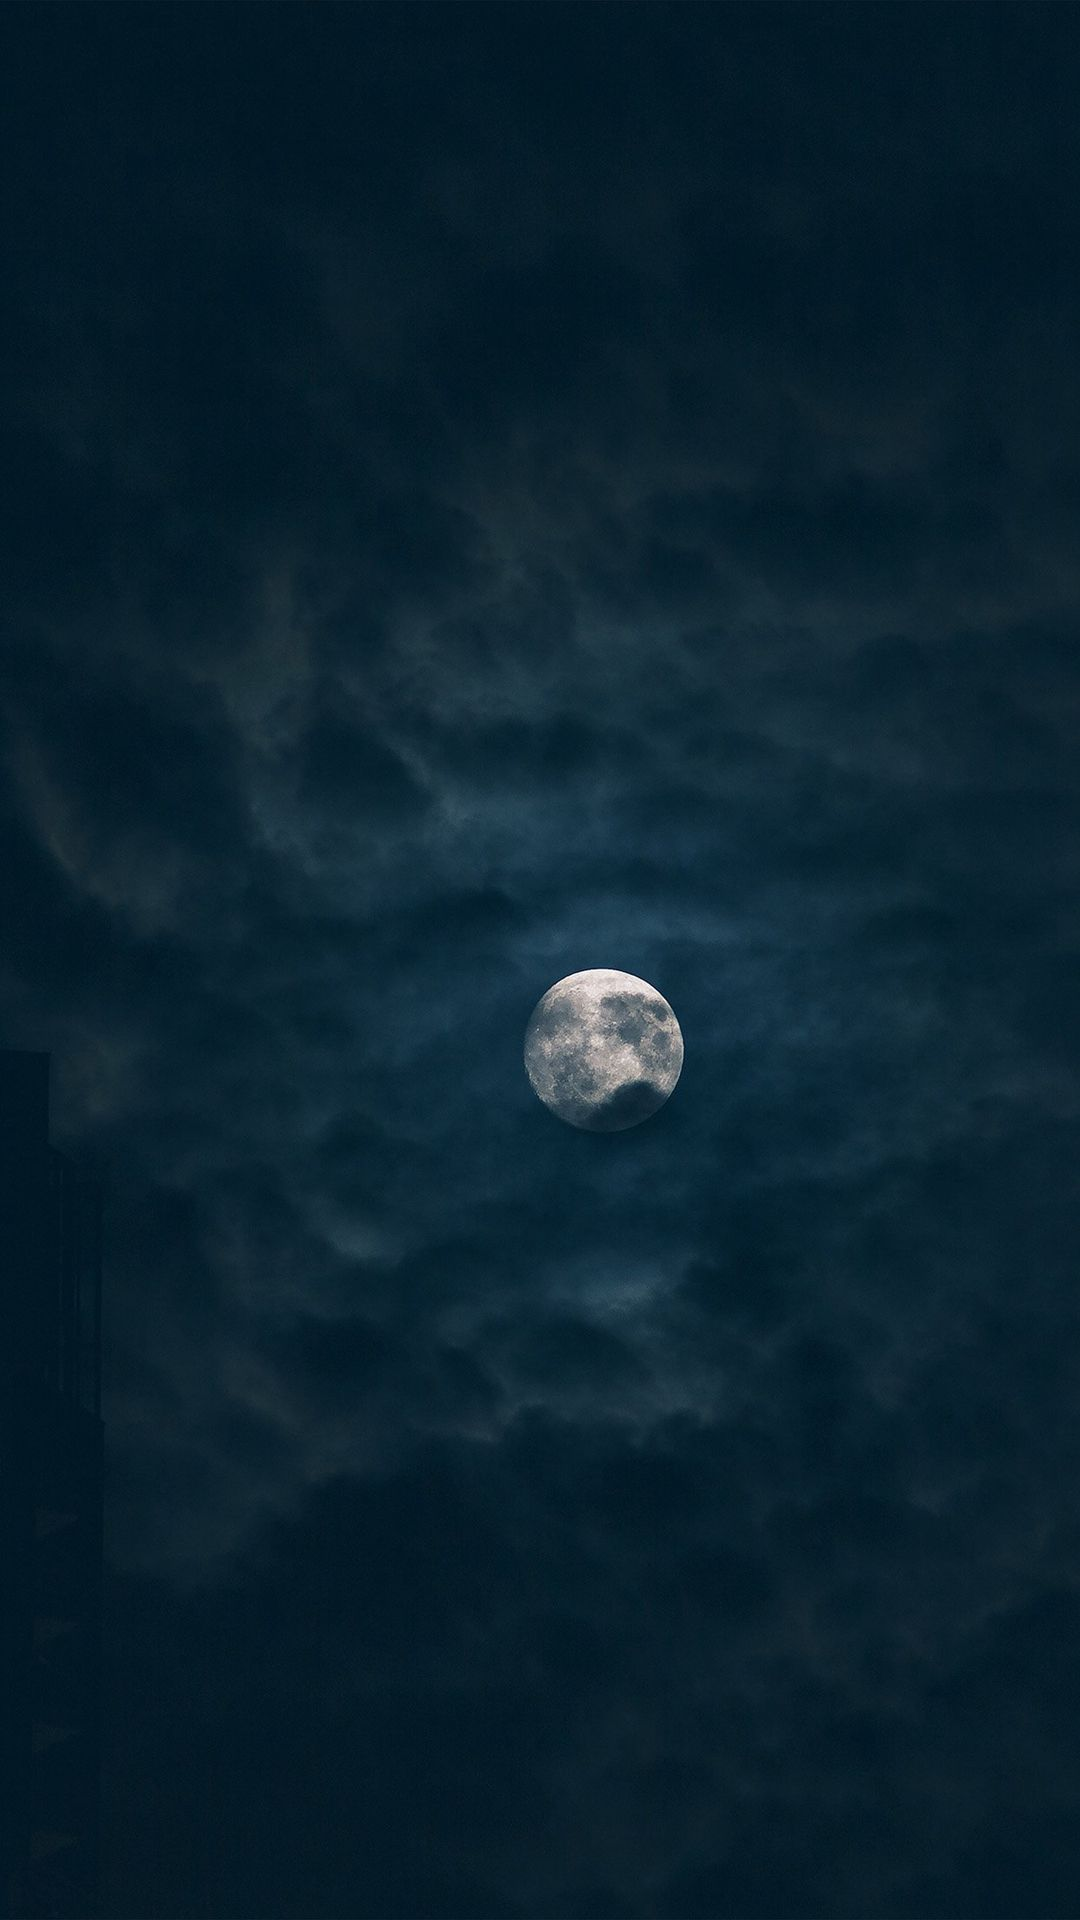 Moon Sky Dark Night Nature iPhone 6 plus wallpaper in